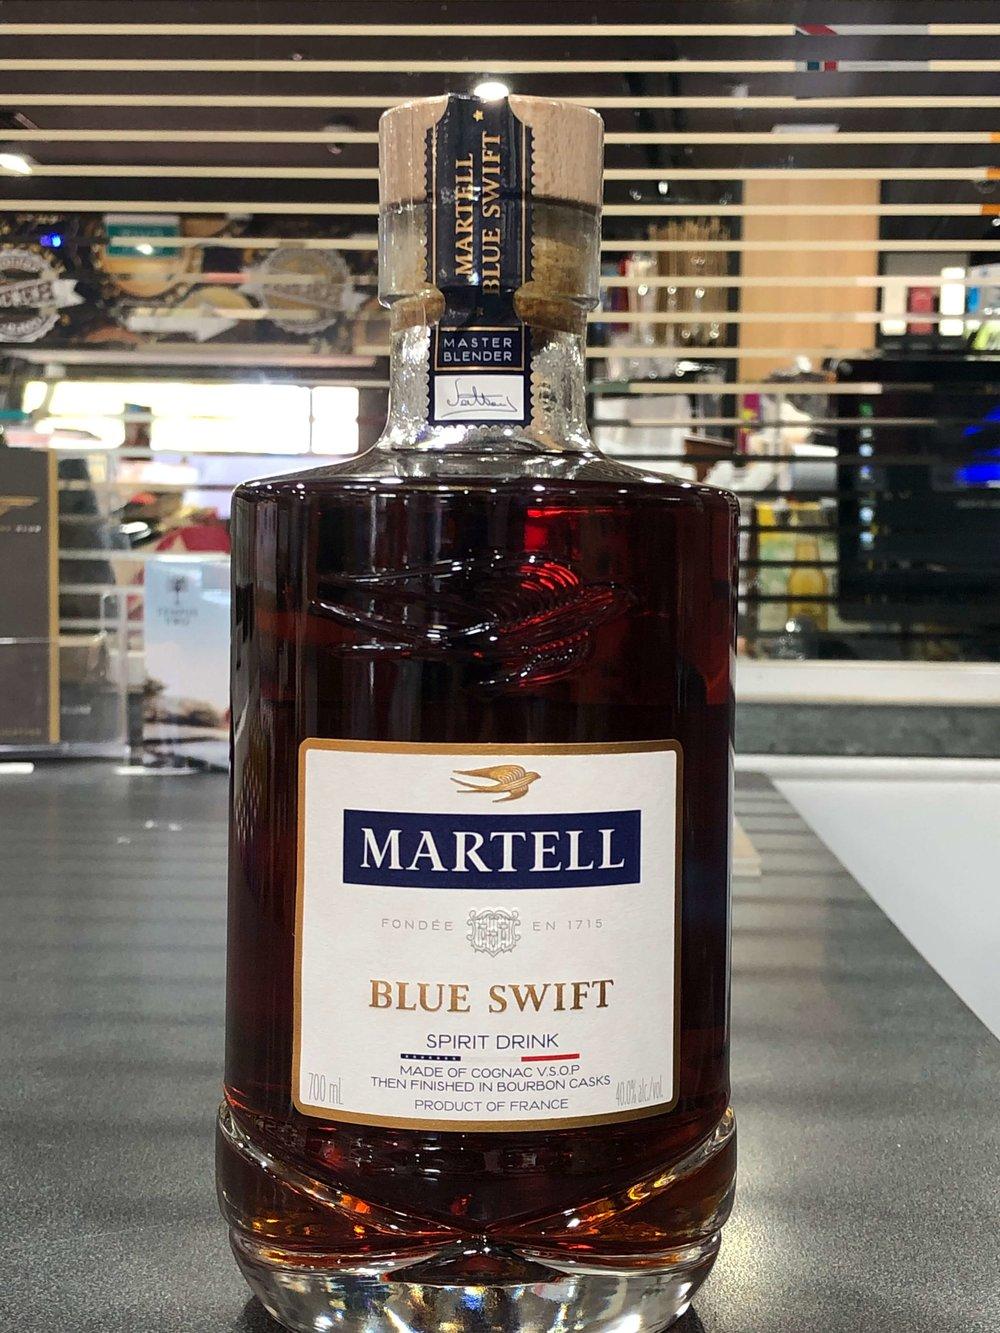 Martell-blue-swift.jpg